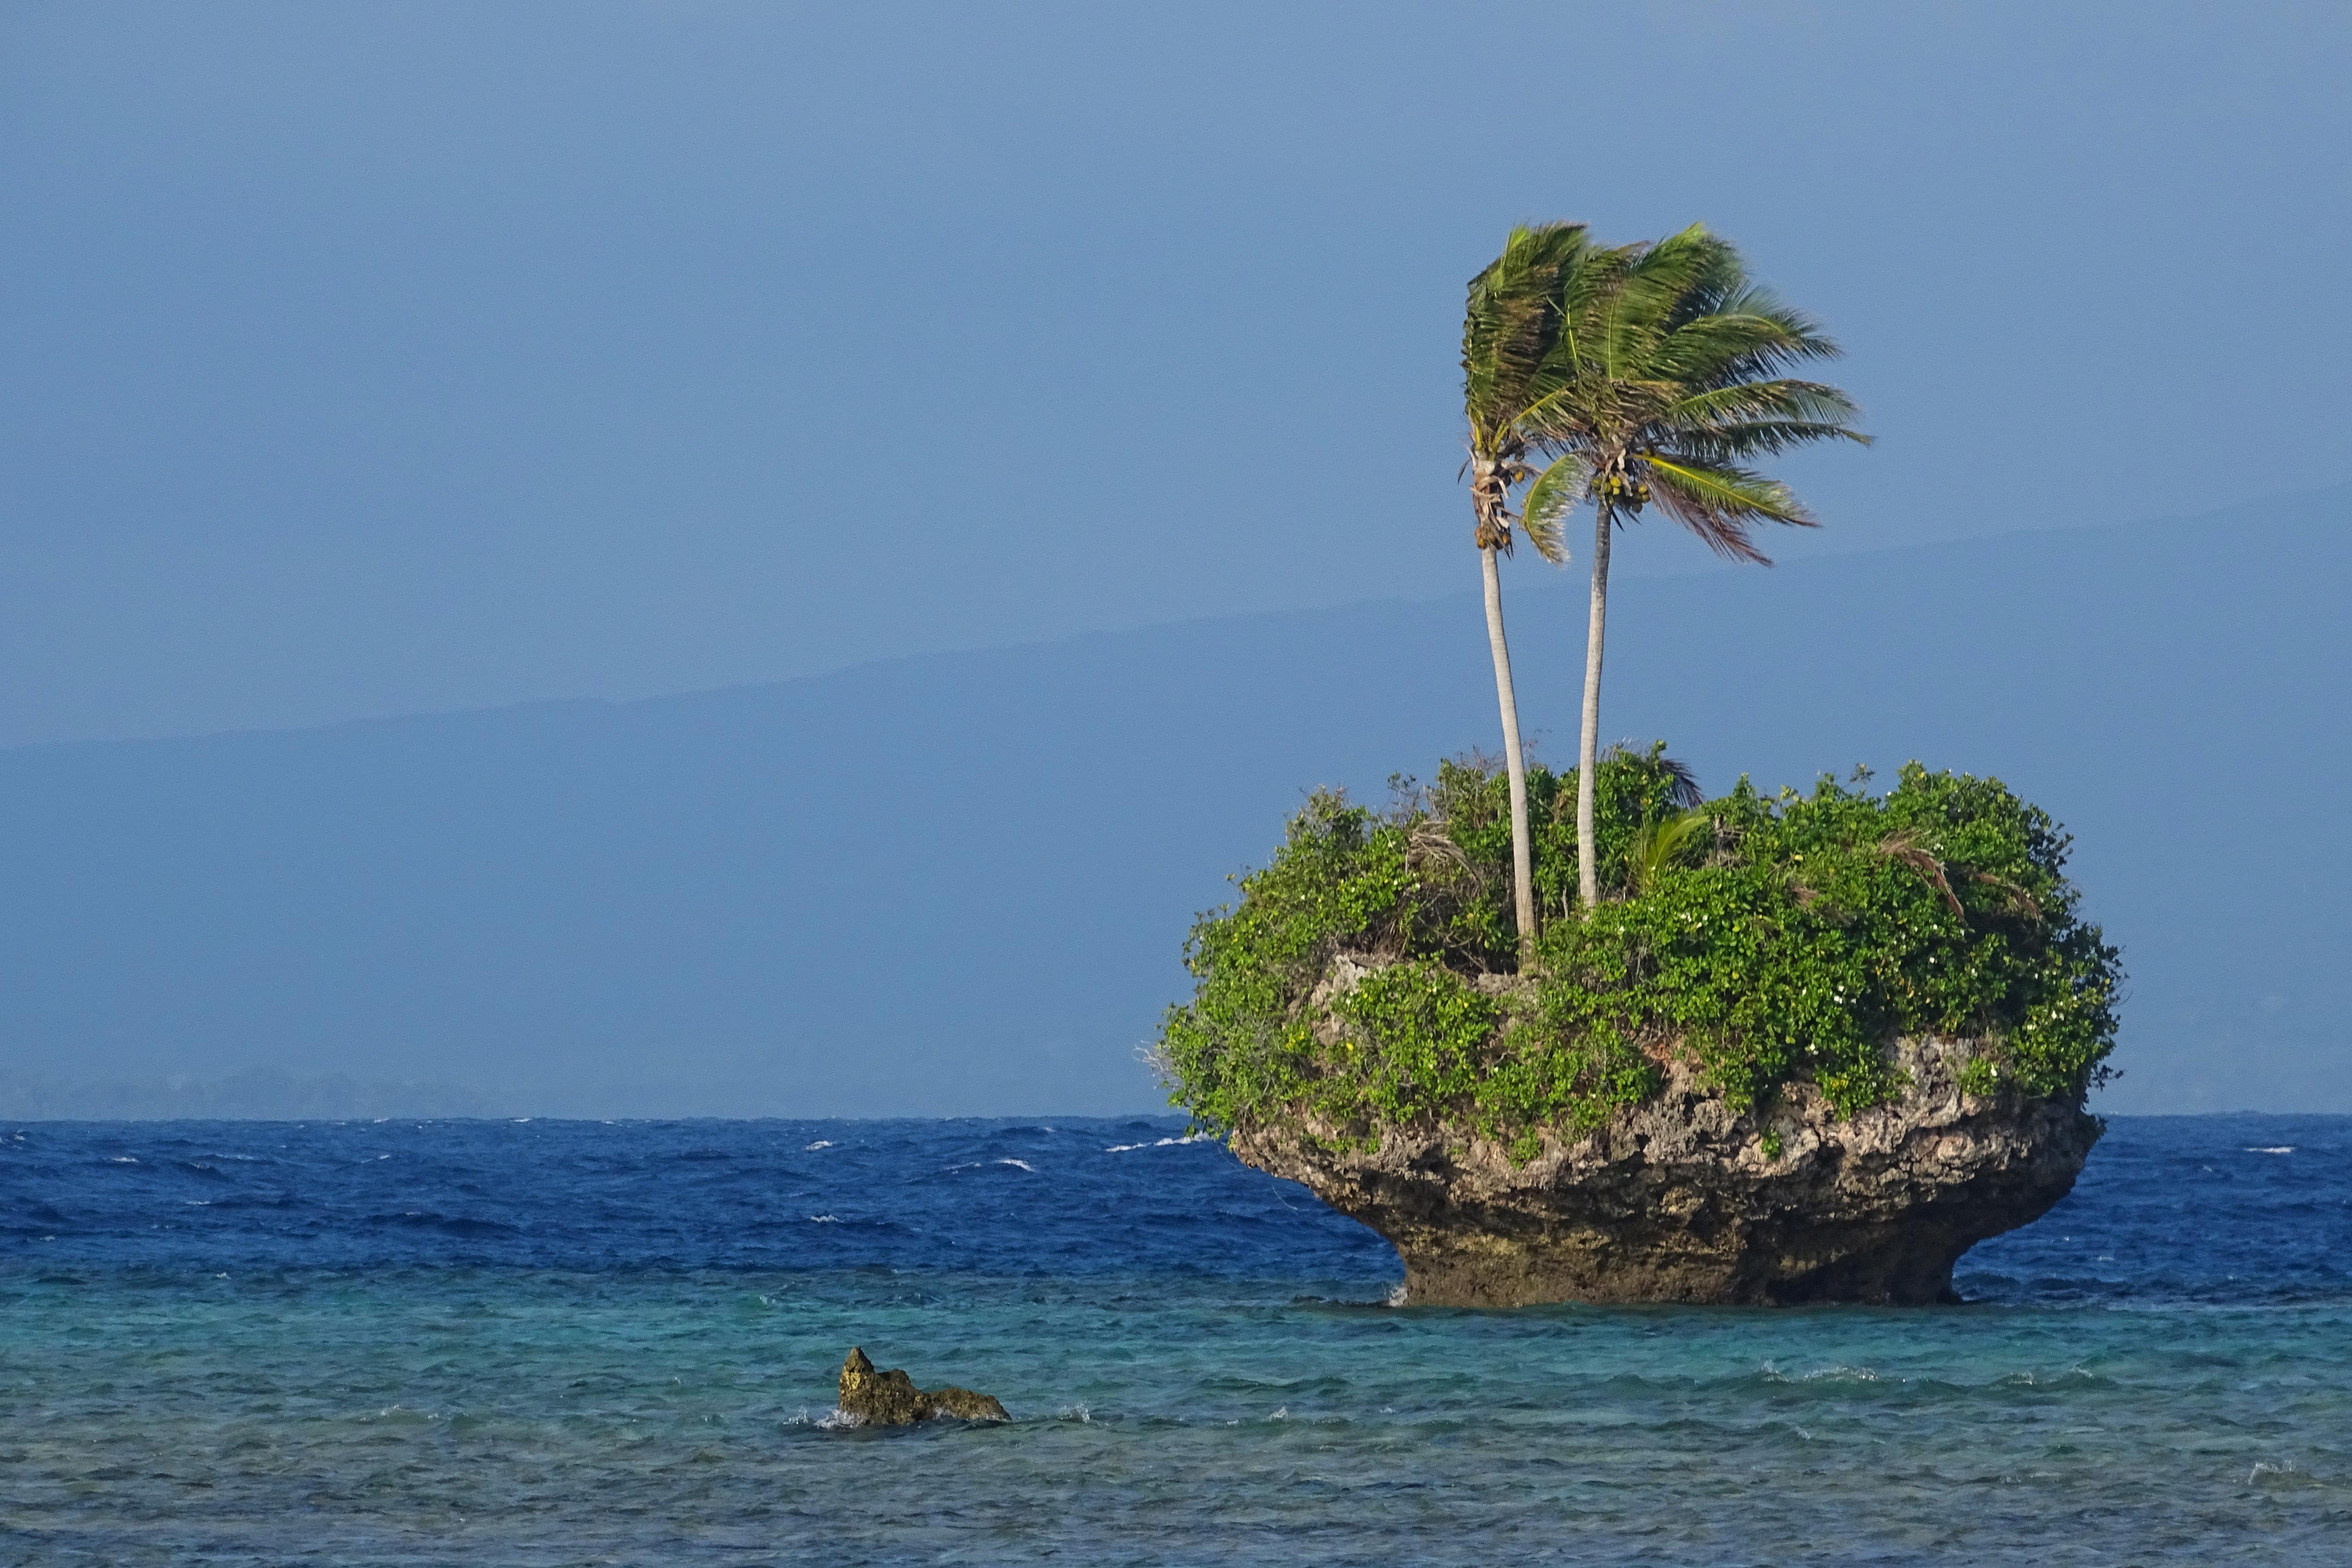 Rah Island - Palm Island